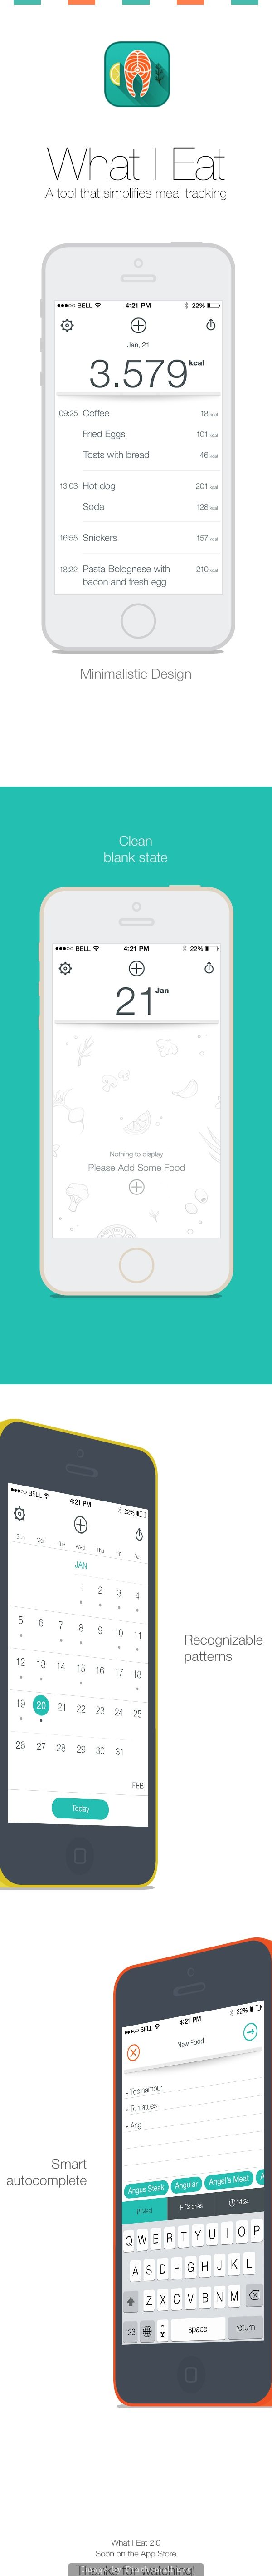 What I Eat App #appdesign #Inspiration #Mobile